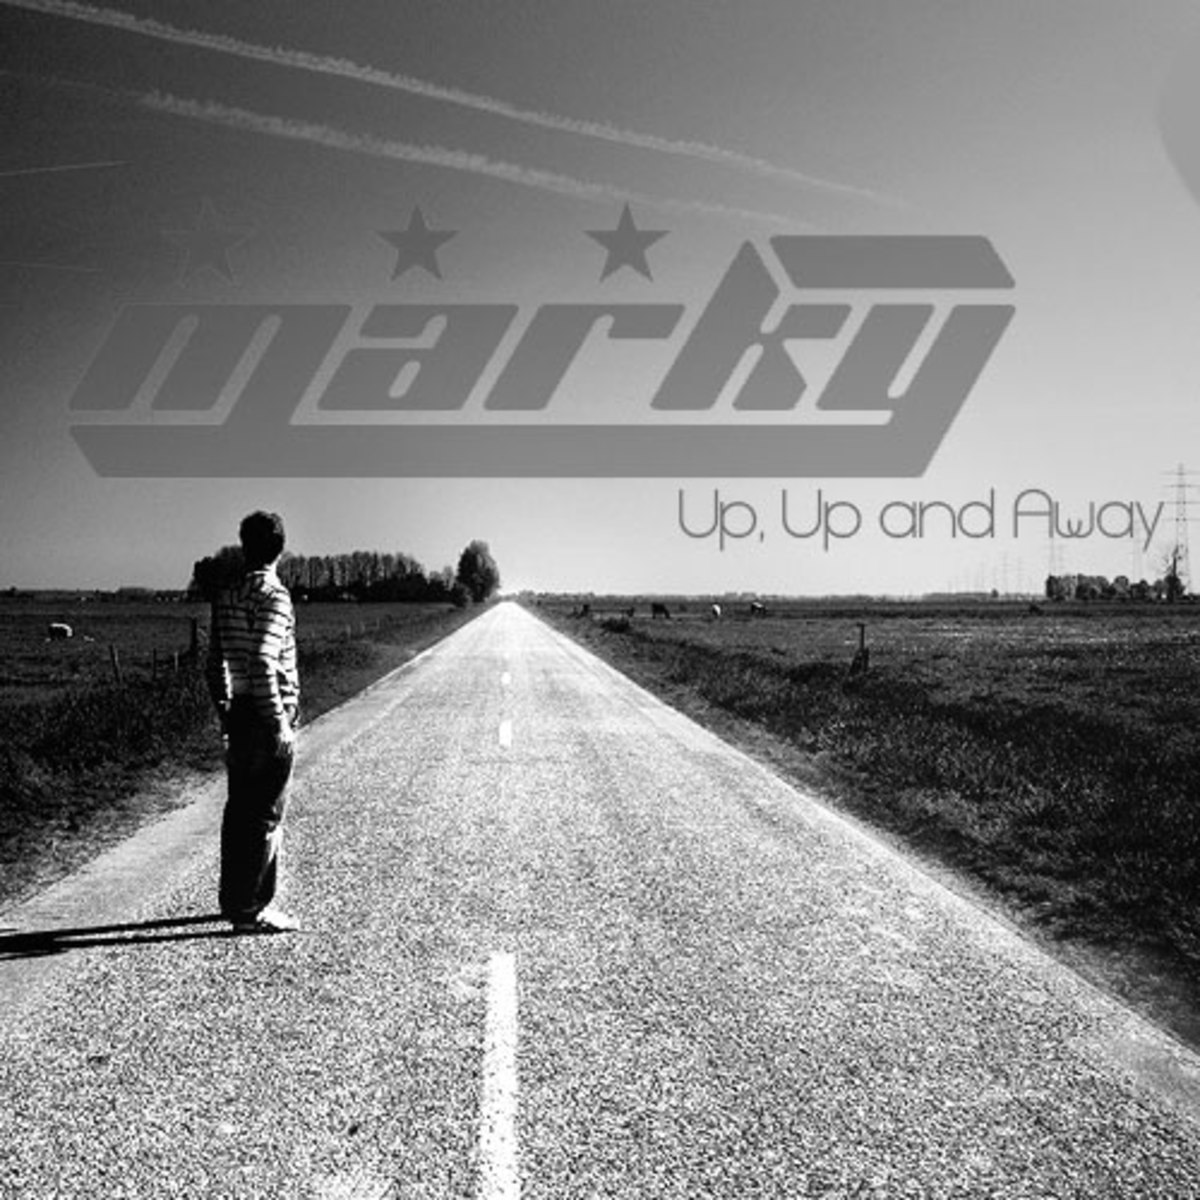 marky-upupaway.jpg